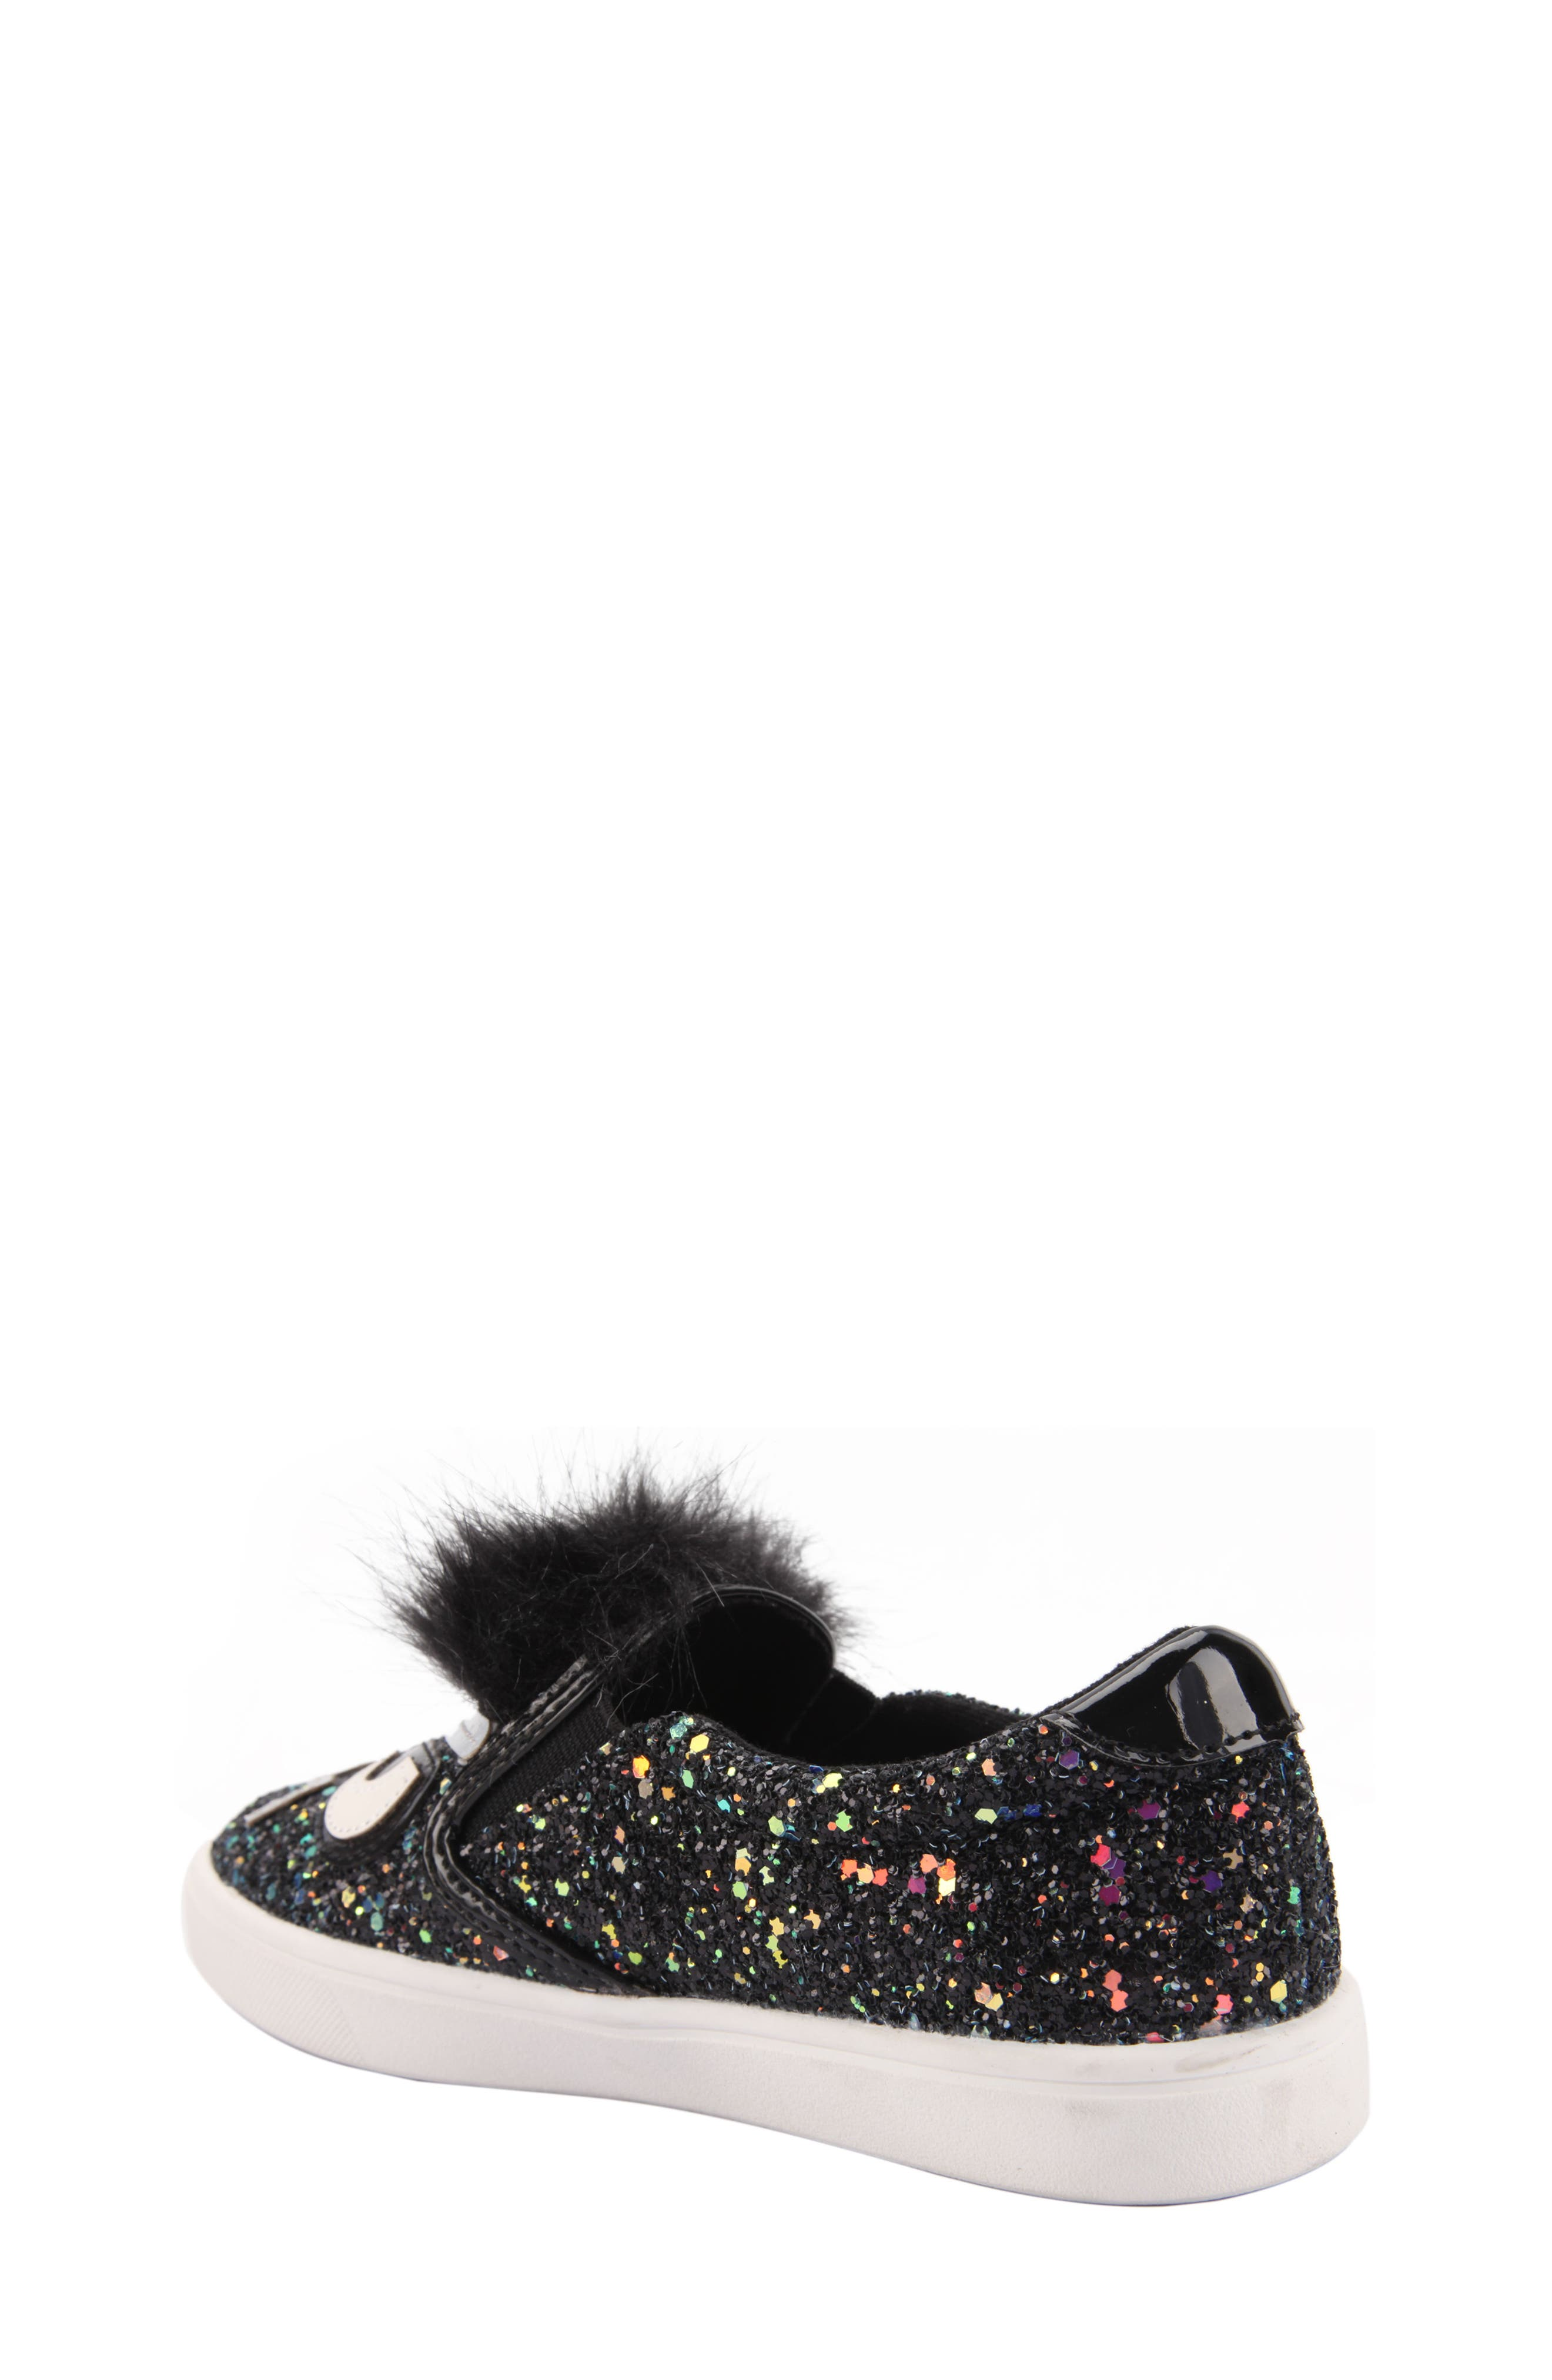 Alyx Faux Fur Glittery Slip-On Sneaker,                             Alternate thumbnail 2, color,                             008